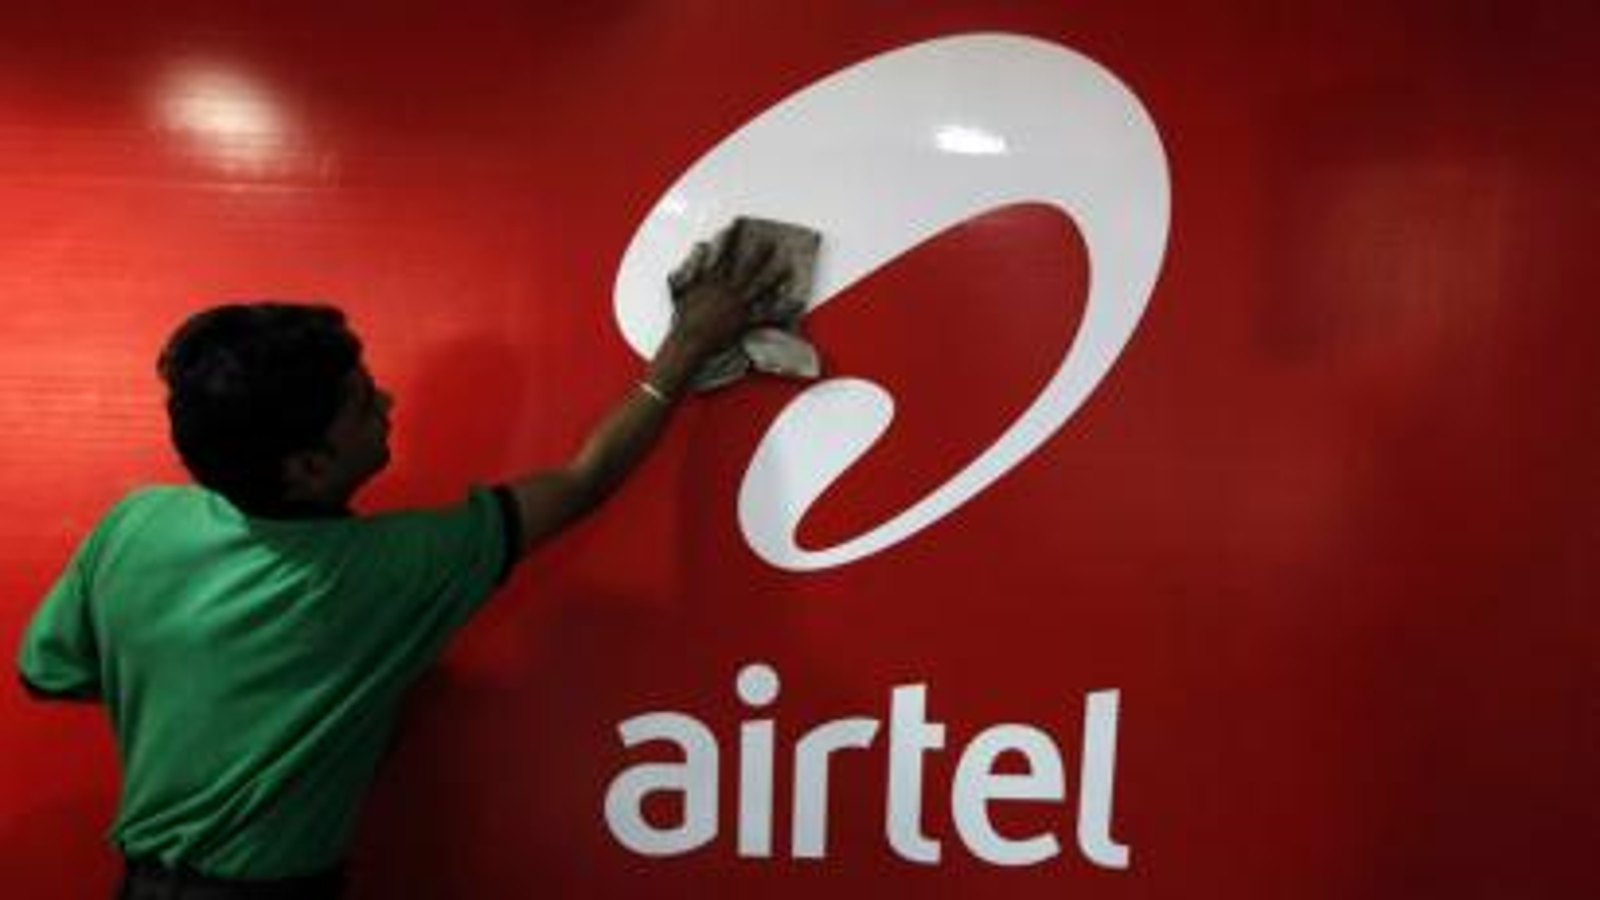 Bharti-Airtel-India-Telecom